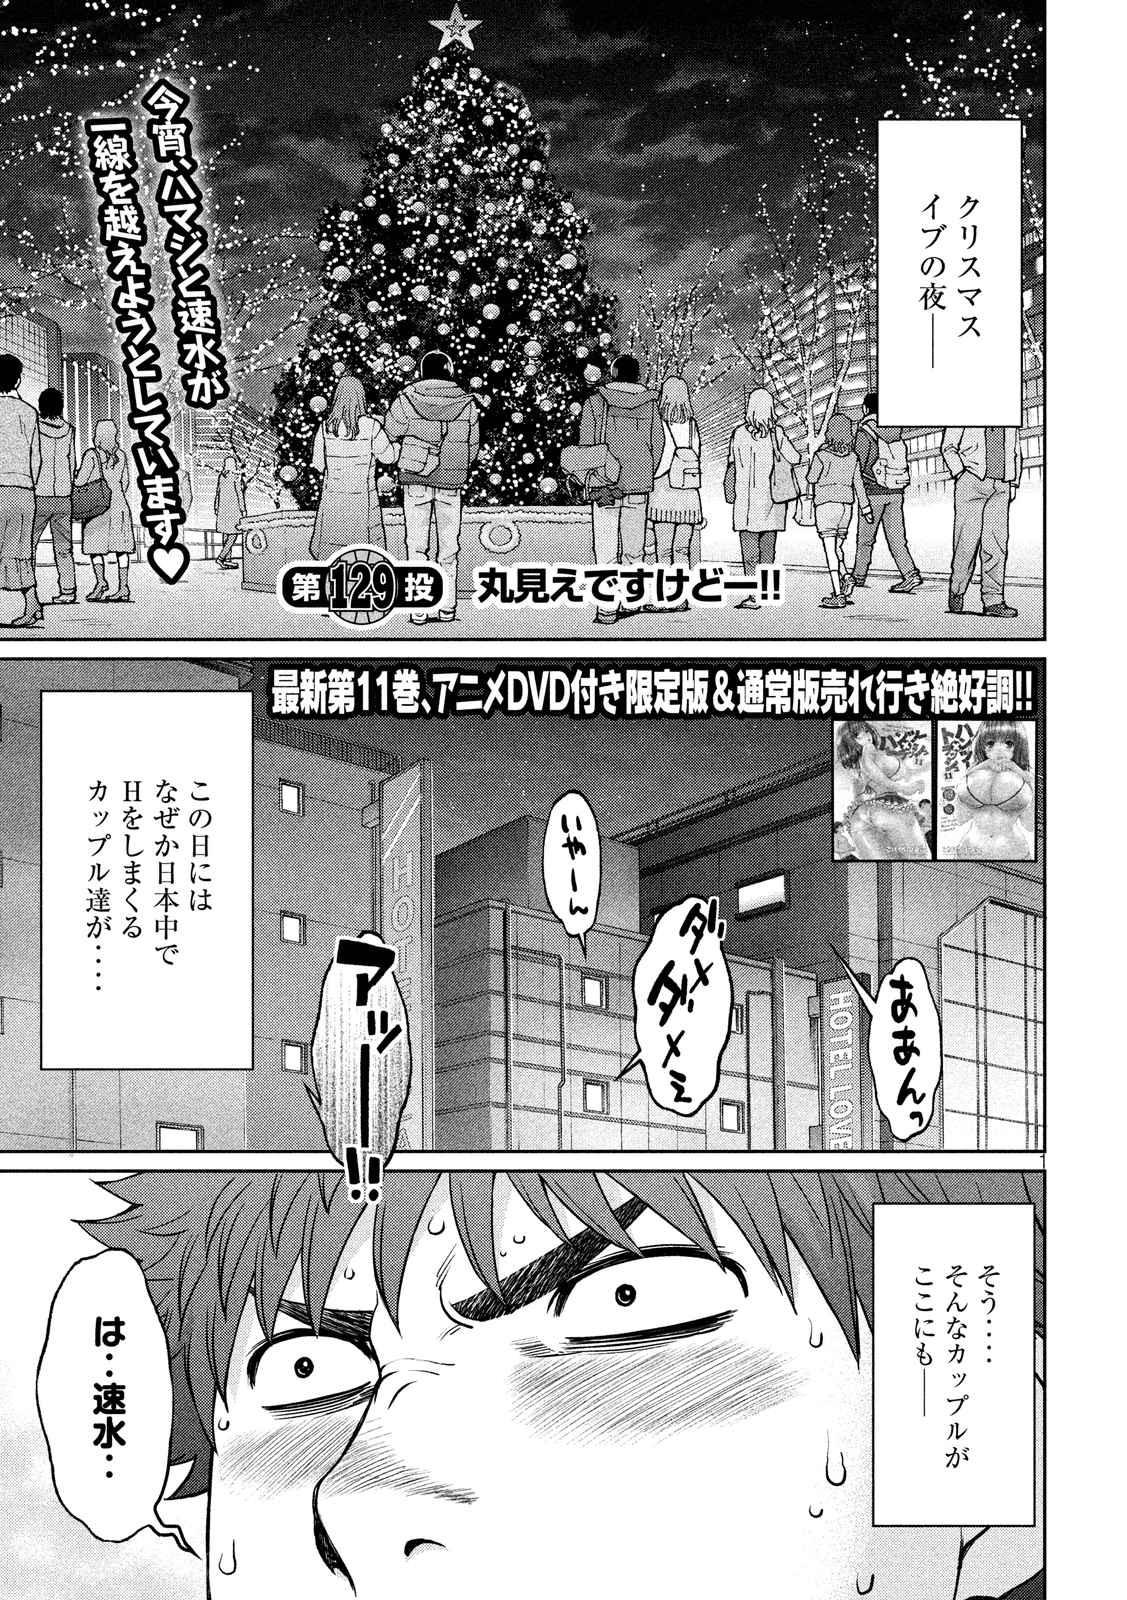 Hantsu x Trash - Chapter 129 - Page 1